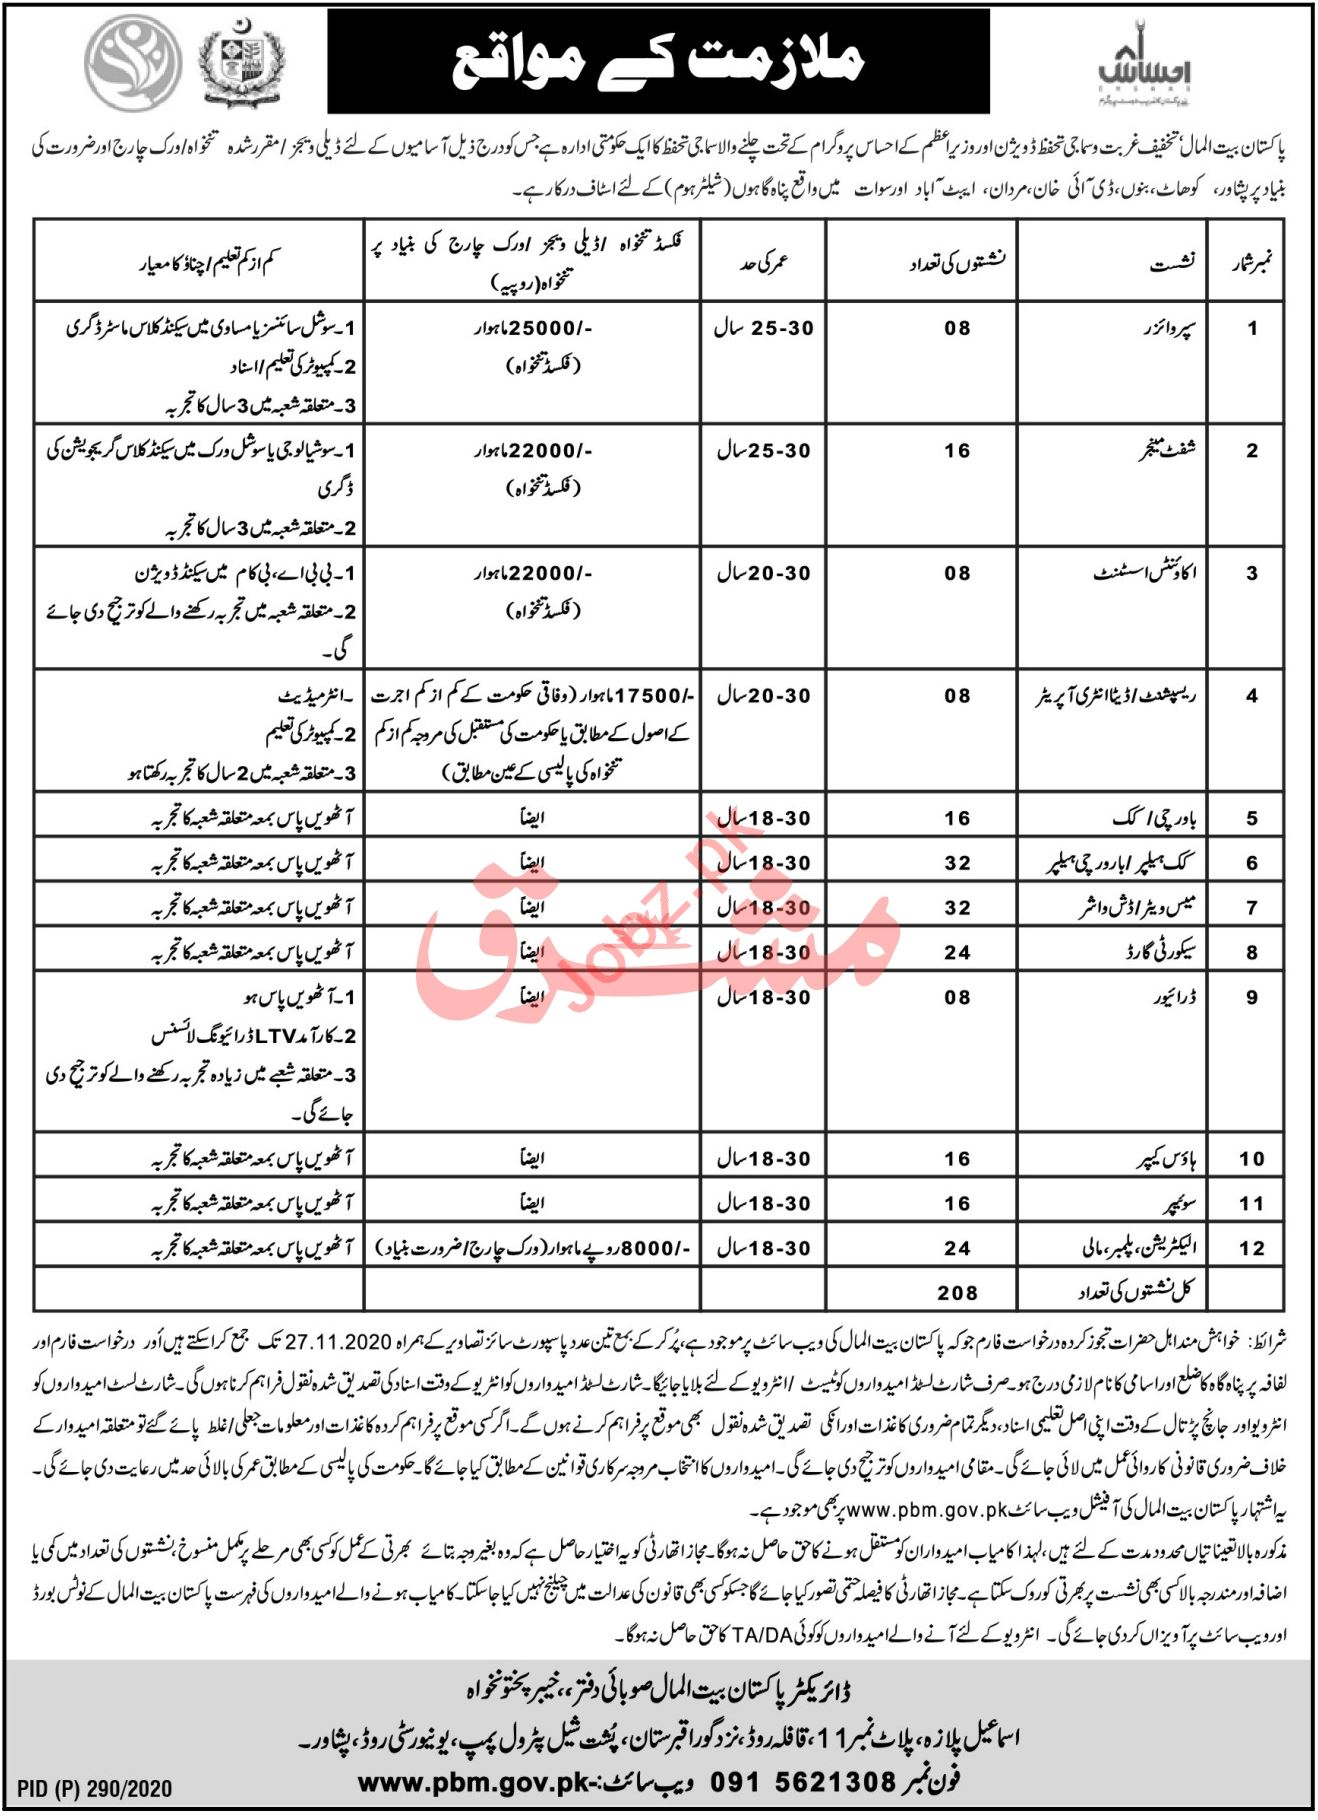 Pakistan Bait ul Mal PBM KPK Jobs 2020 for Manager & Cook